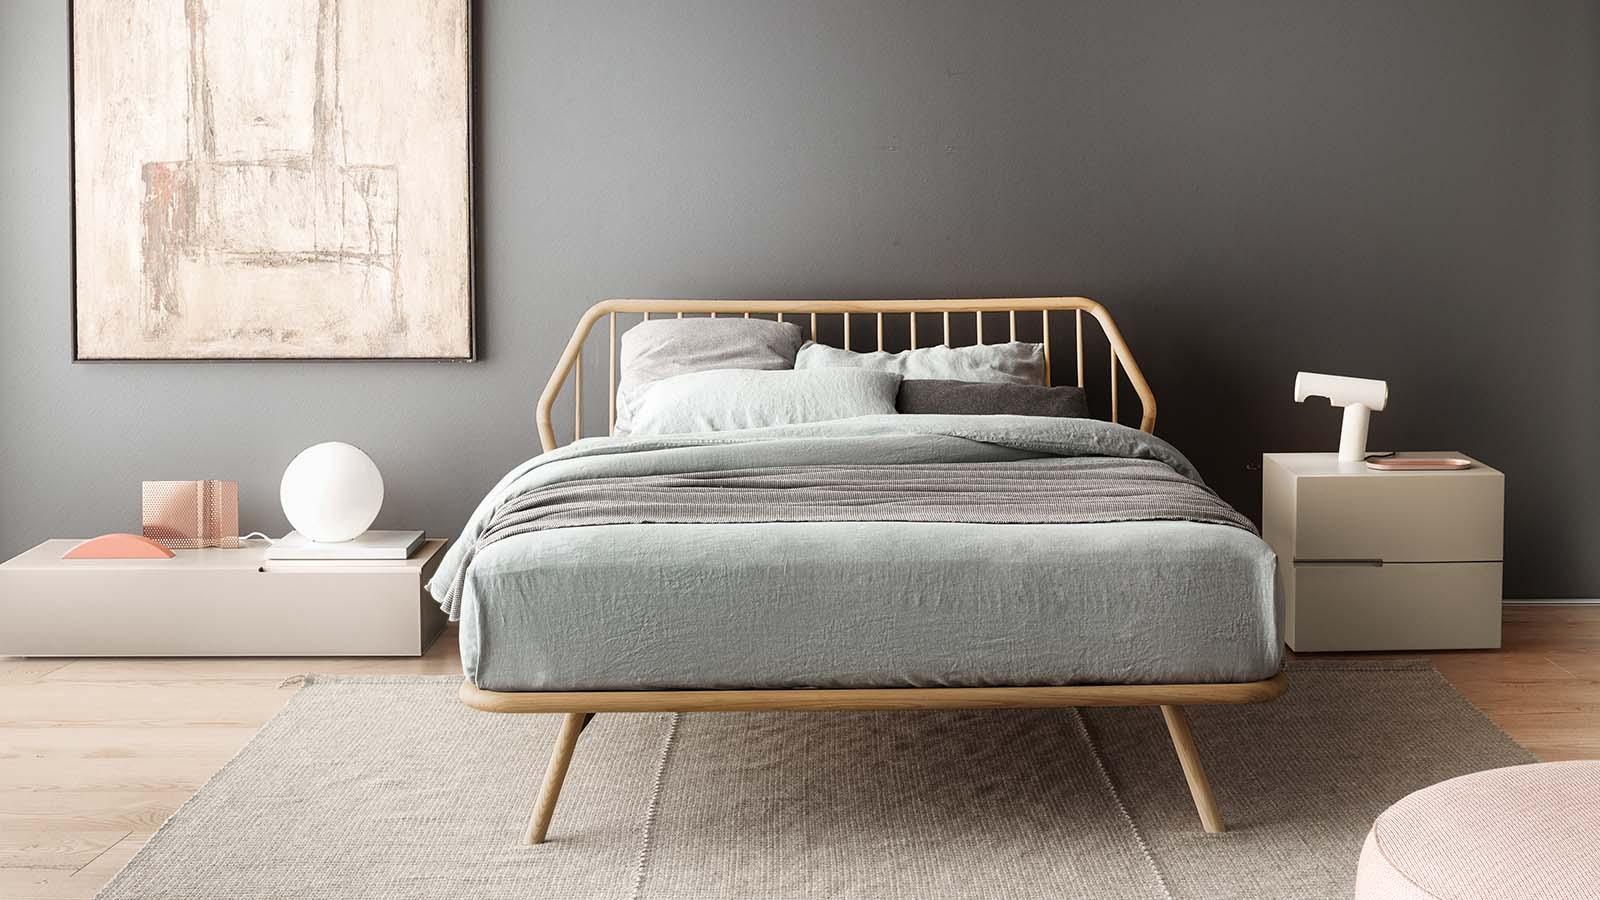 Trama-wood-bed-design-testata-PIANCA